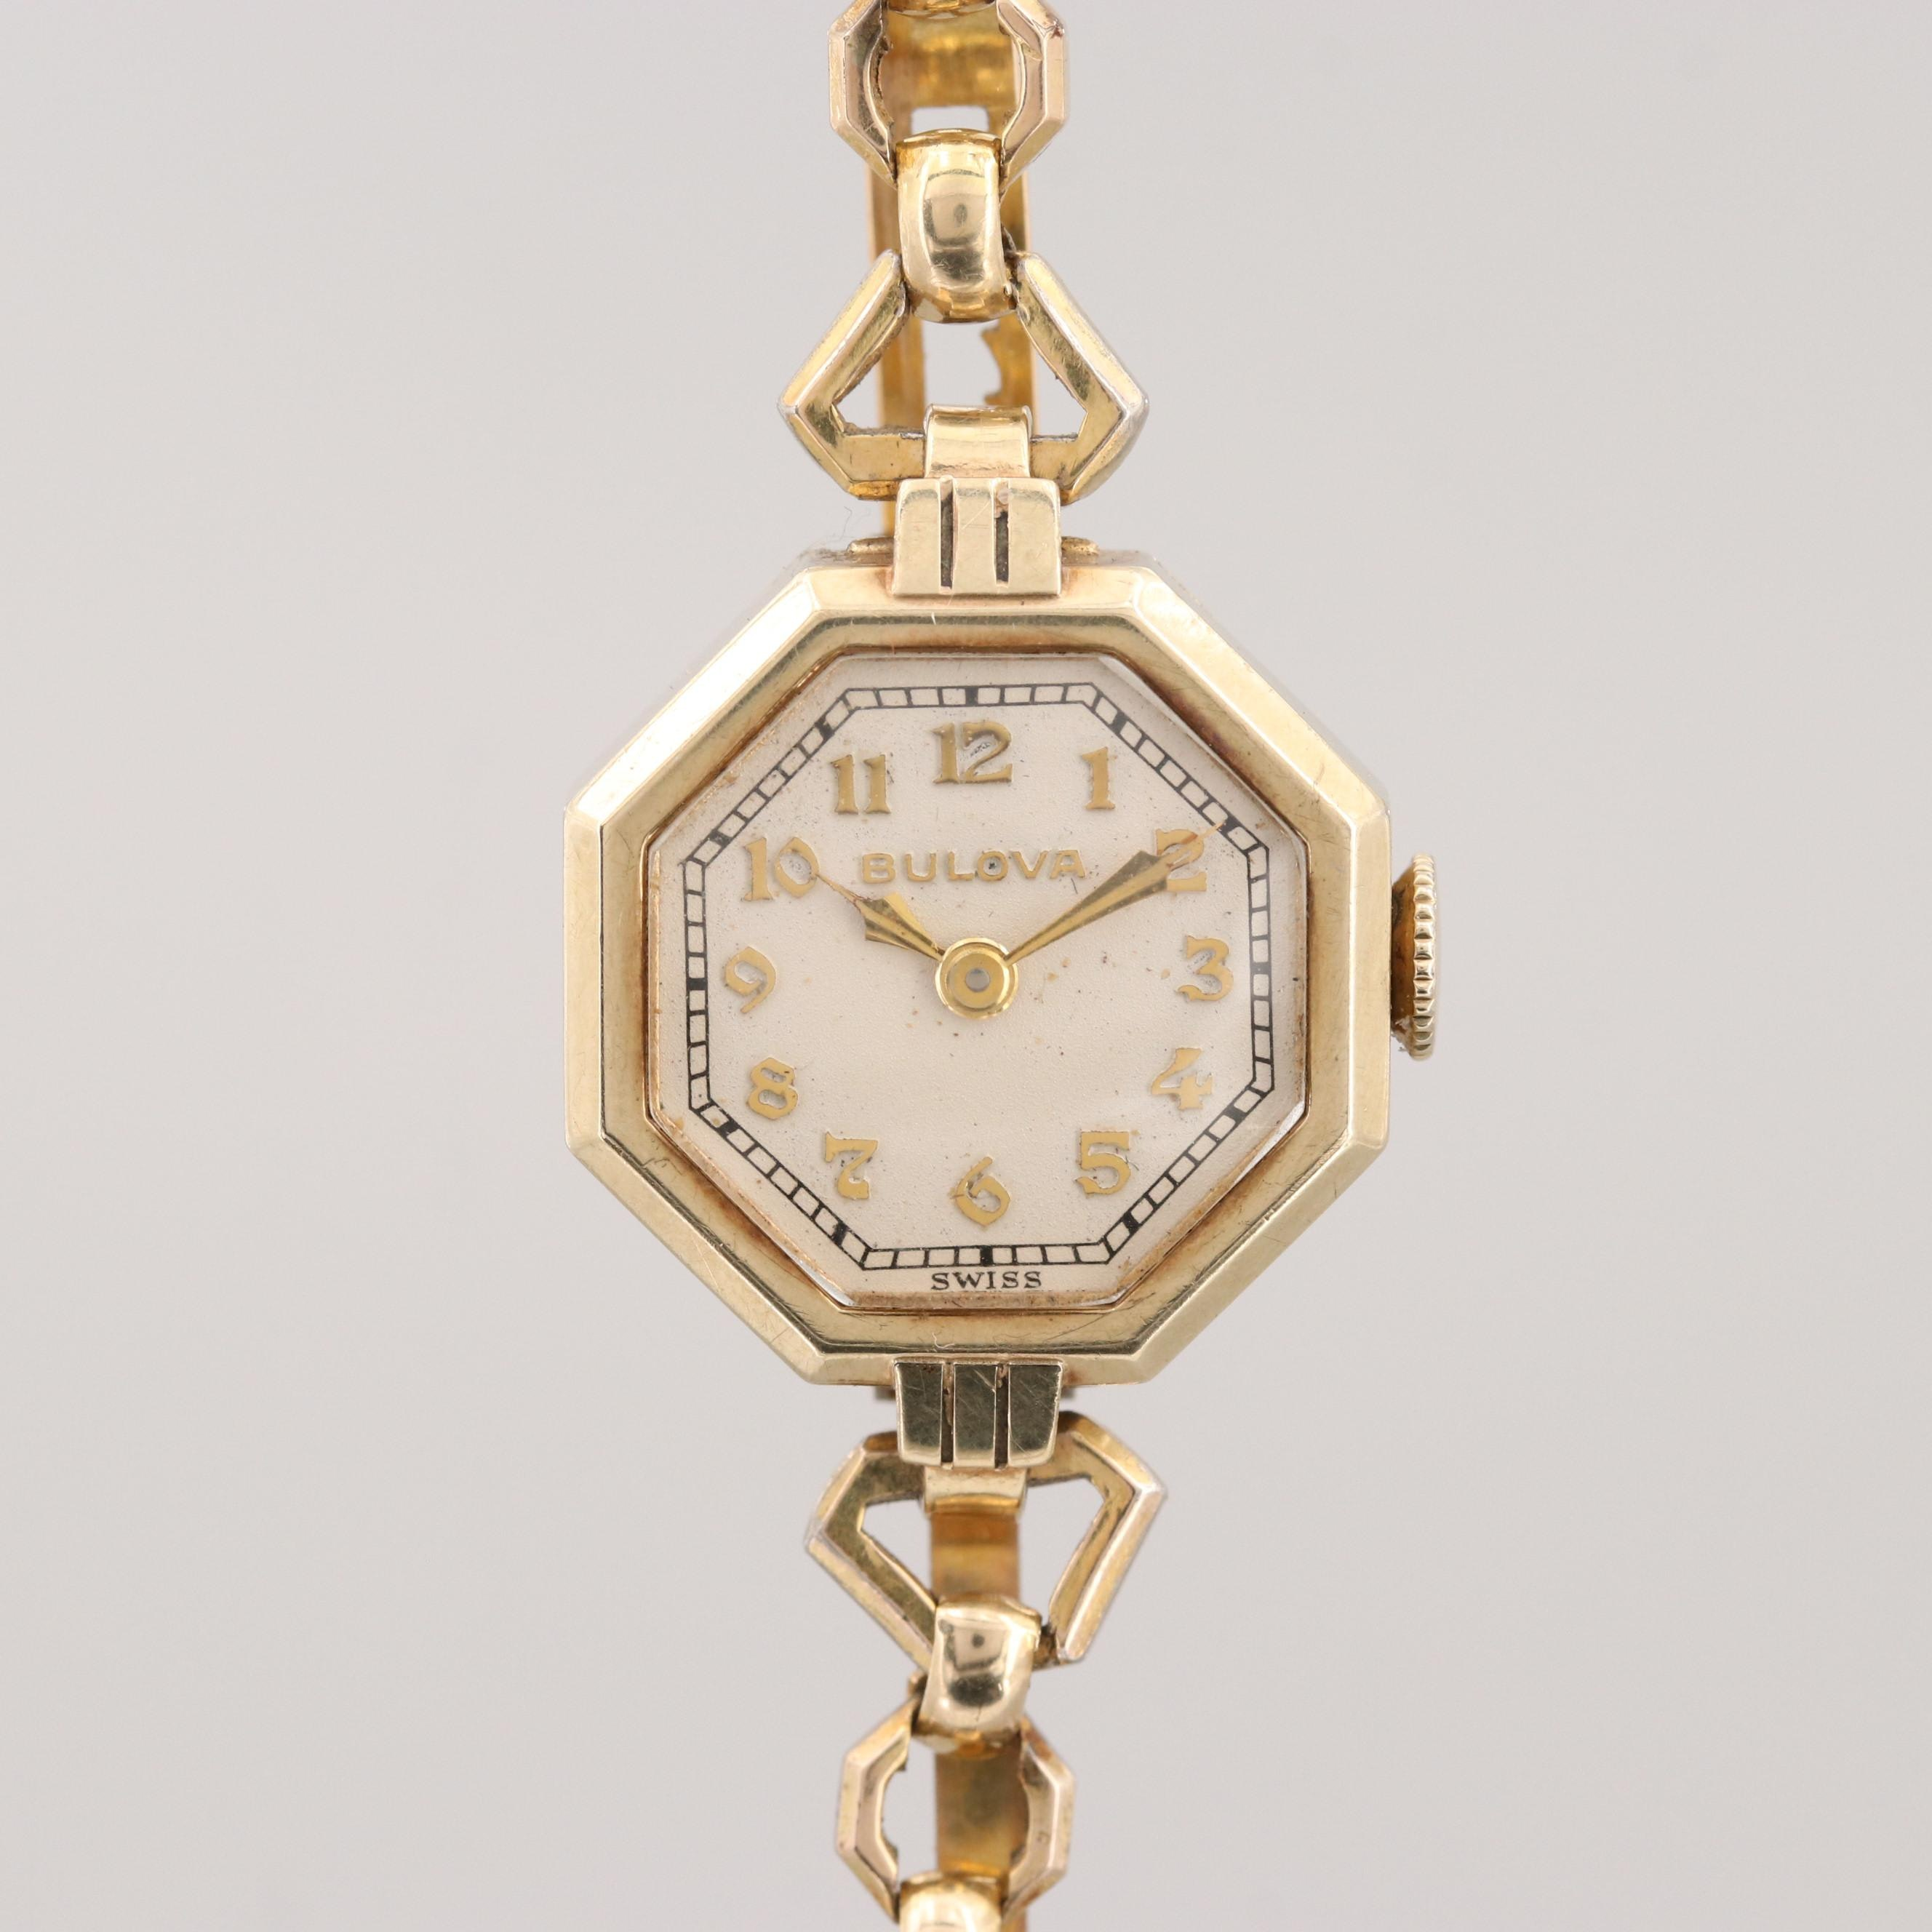 Vintage Bulova Rolled Gold Stem Wind Wristwatch